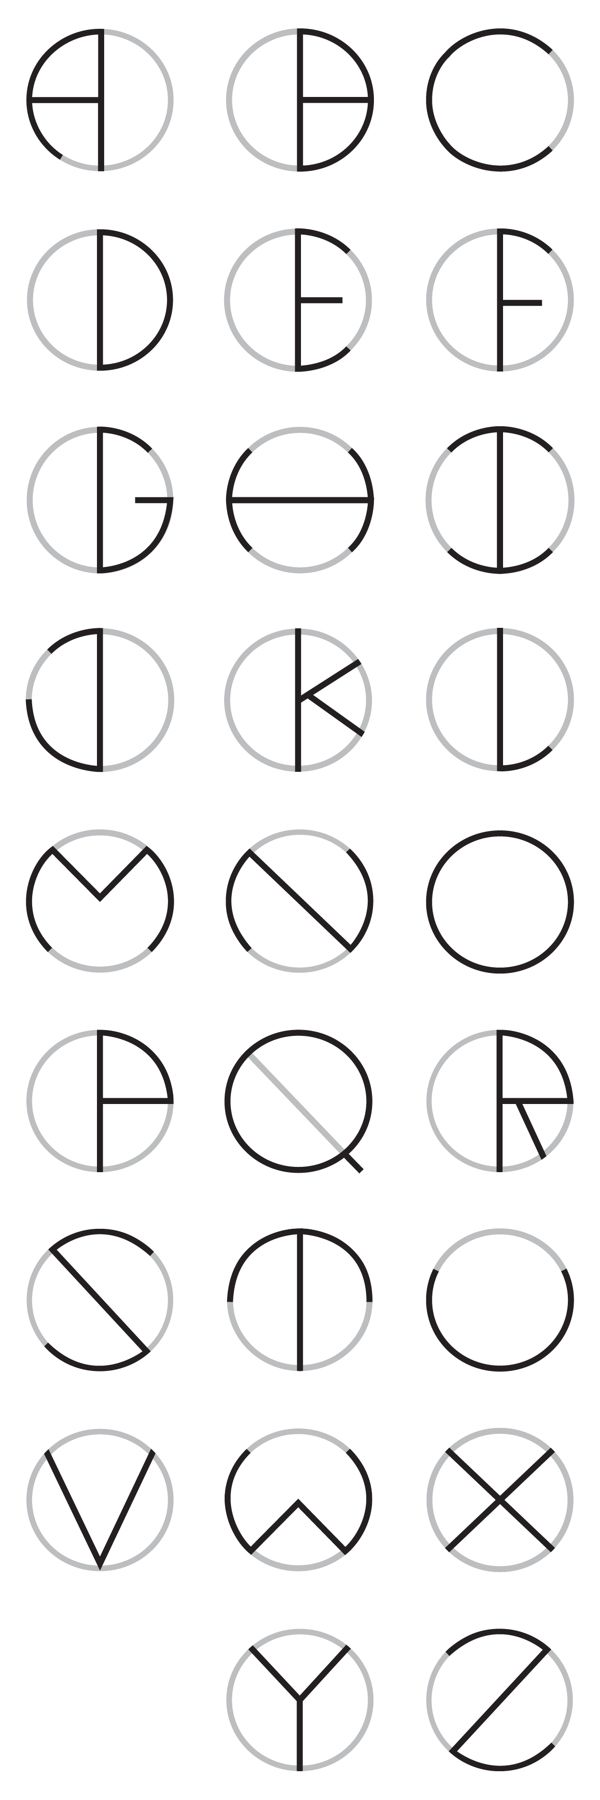 Circle Typeface by Oscar Lopes, via Behance